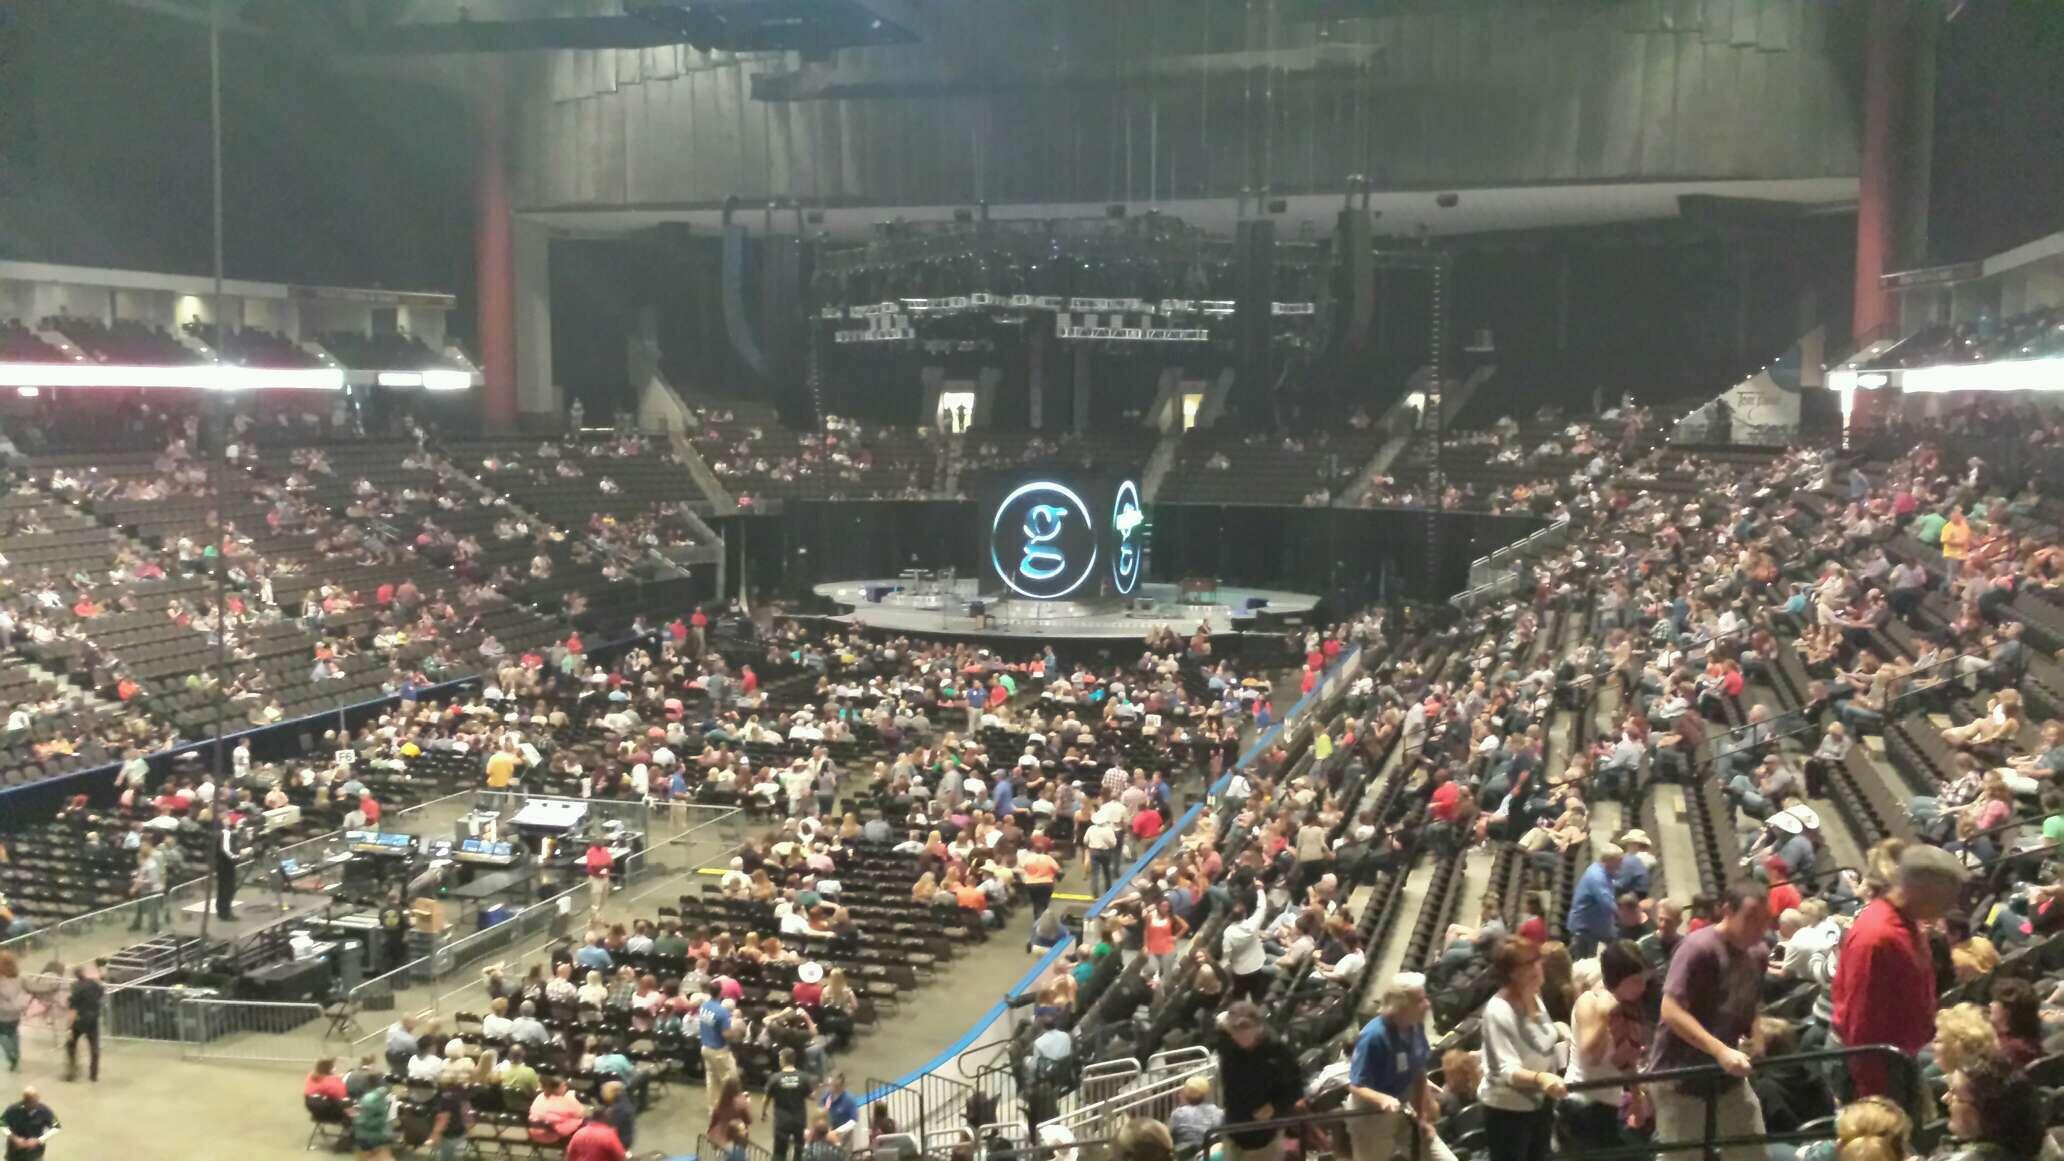 VyStar Veterans Memorial Arena Section 107 Row AA Seat 11